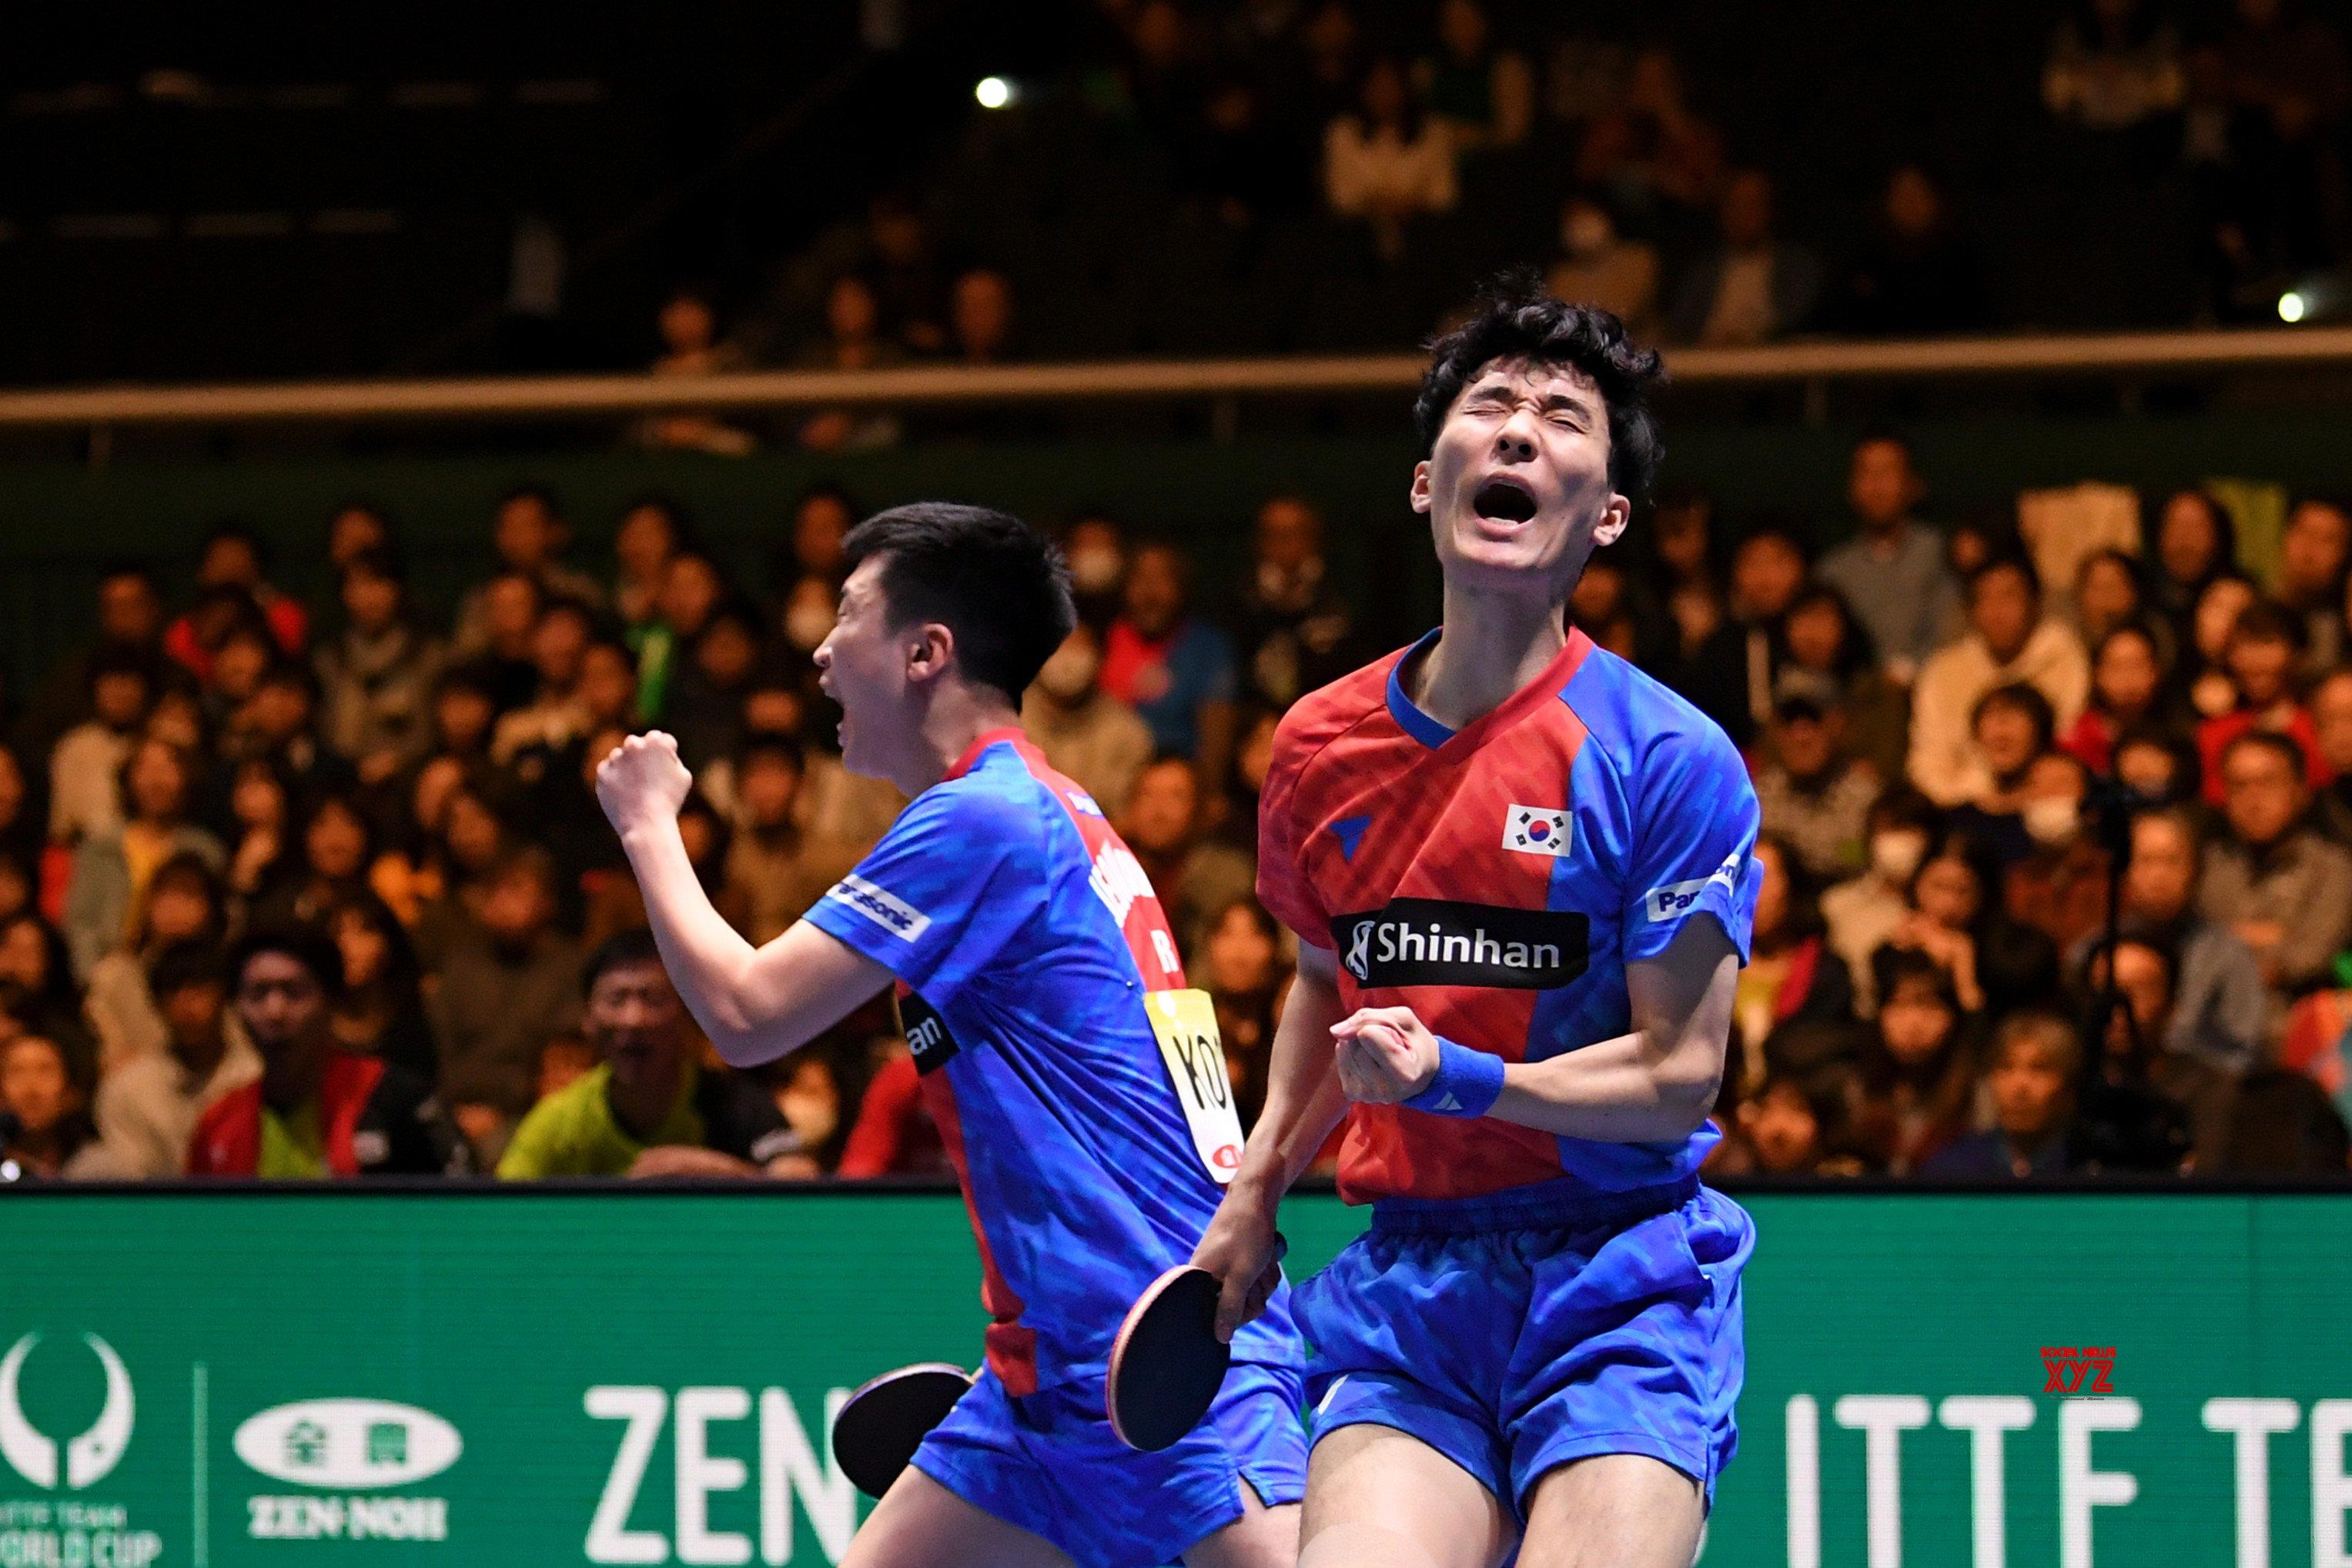 JAPAN - TOKYO - TABLE TENNIS - ITTF TEAM WORLD CUP #Gallery